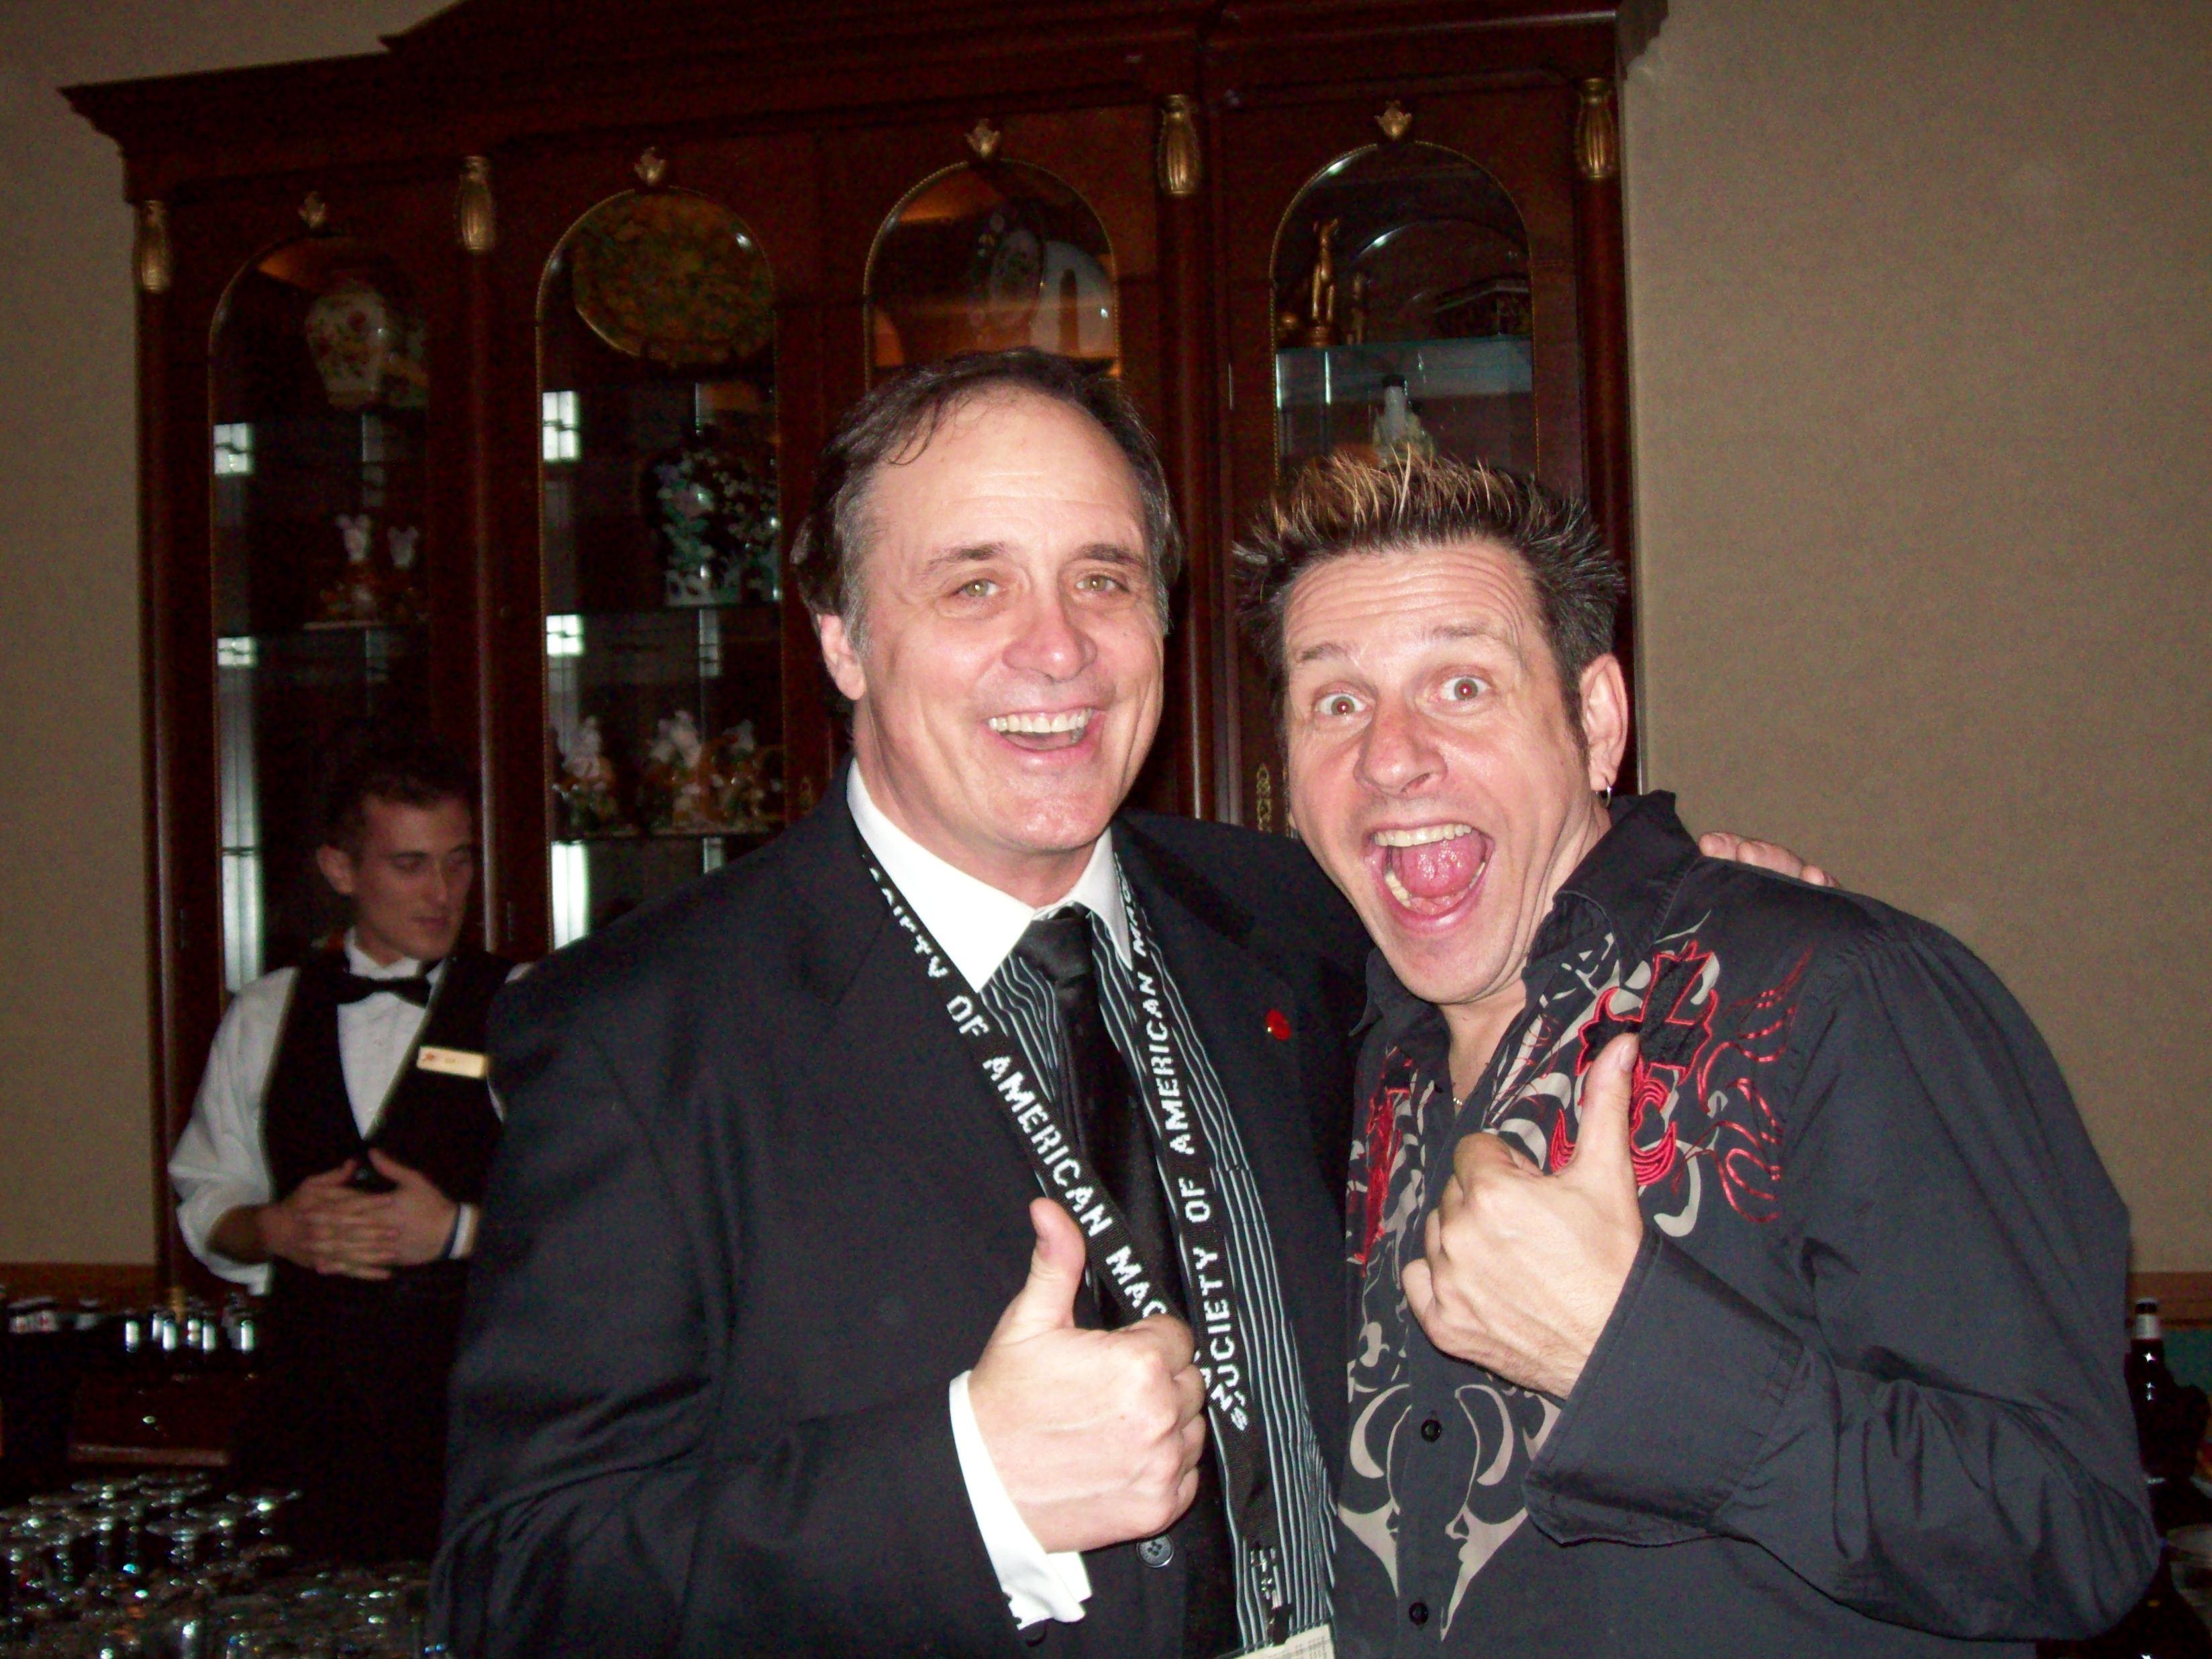 Dal & Shawn Farquar